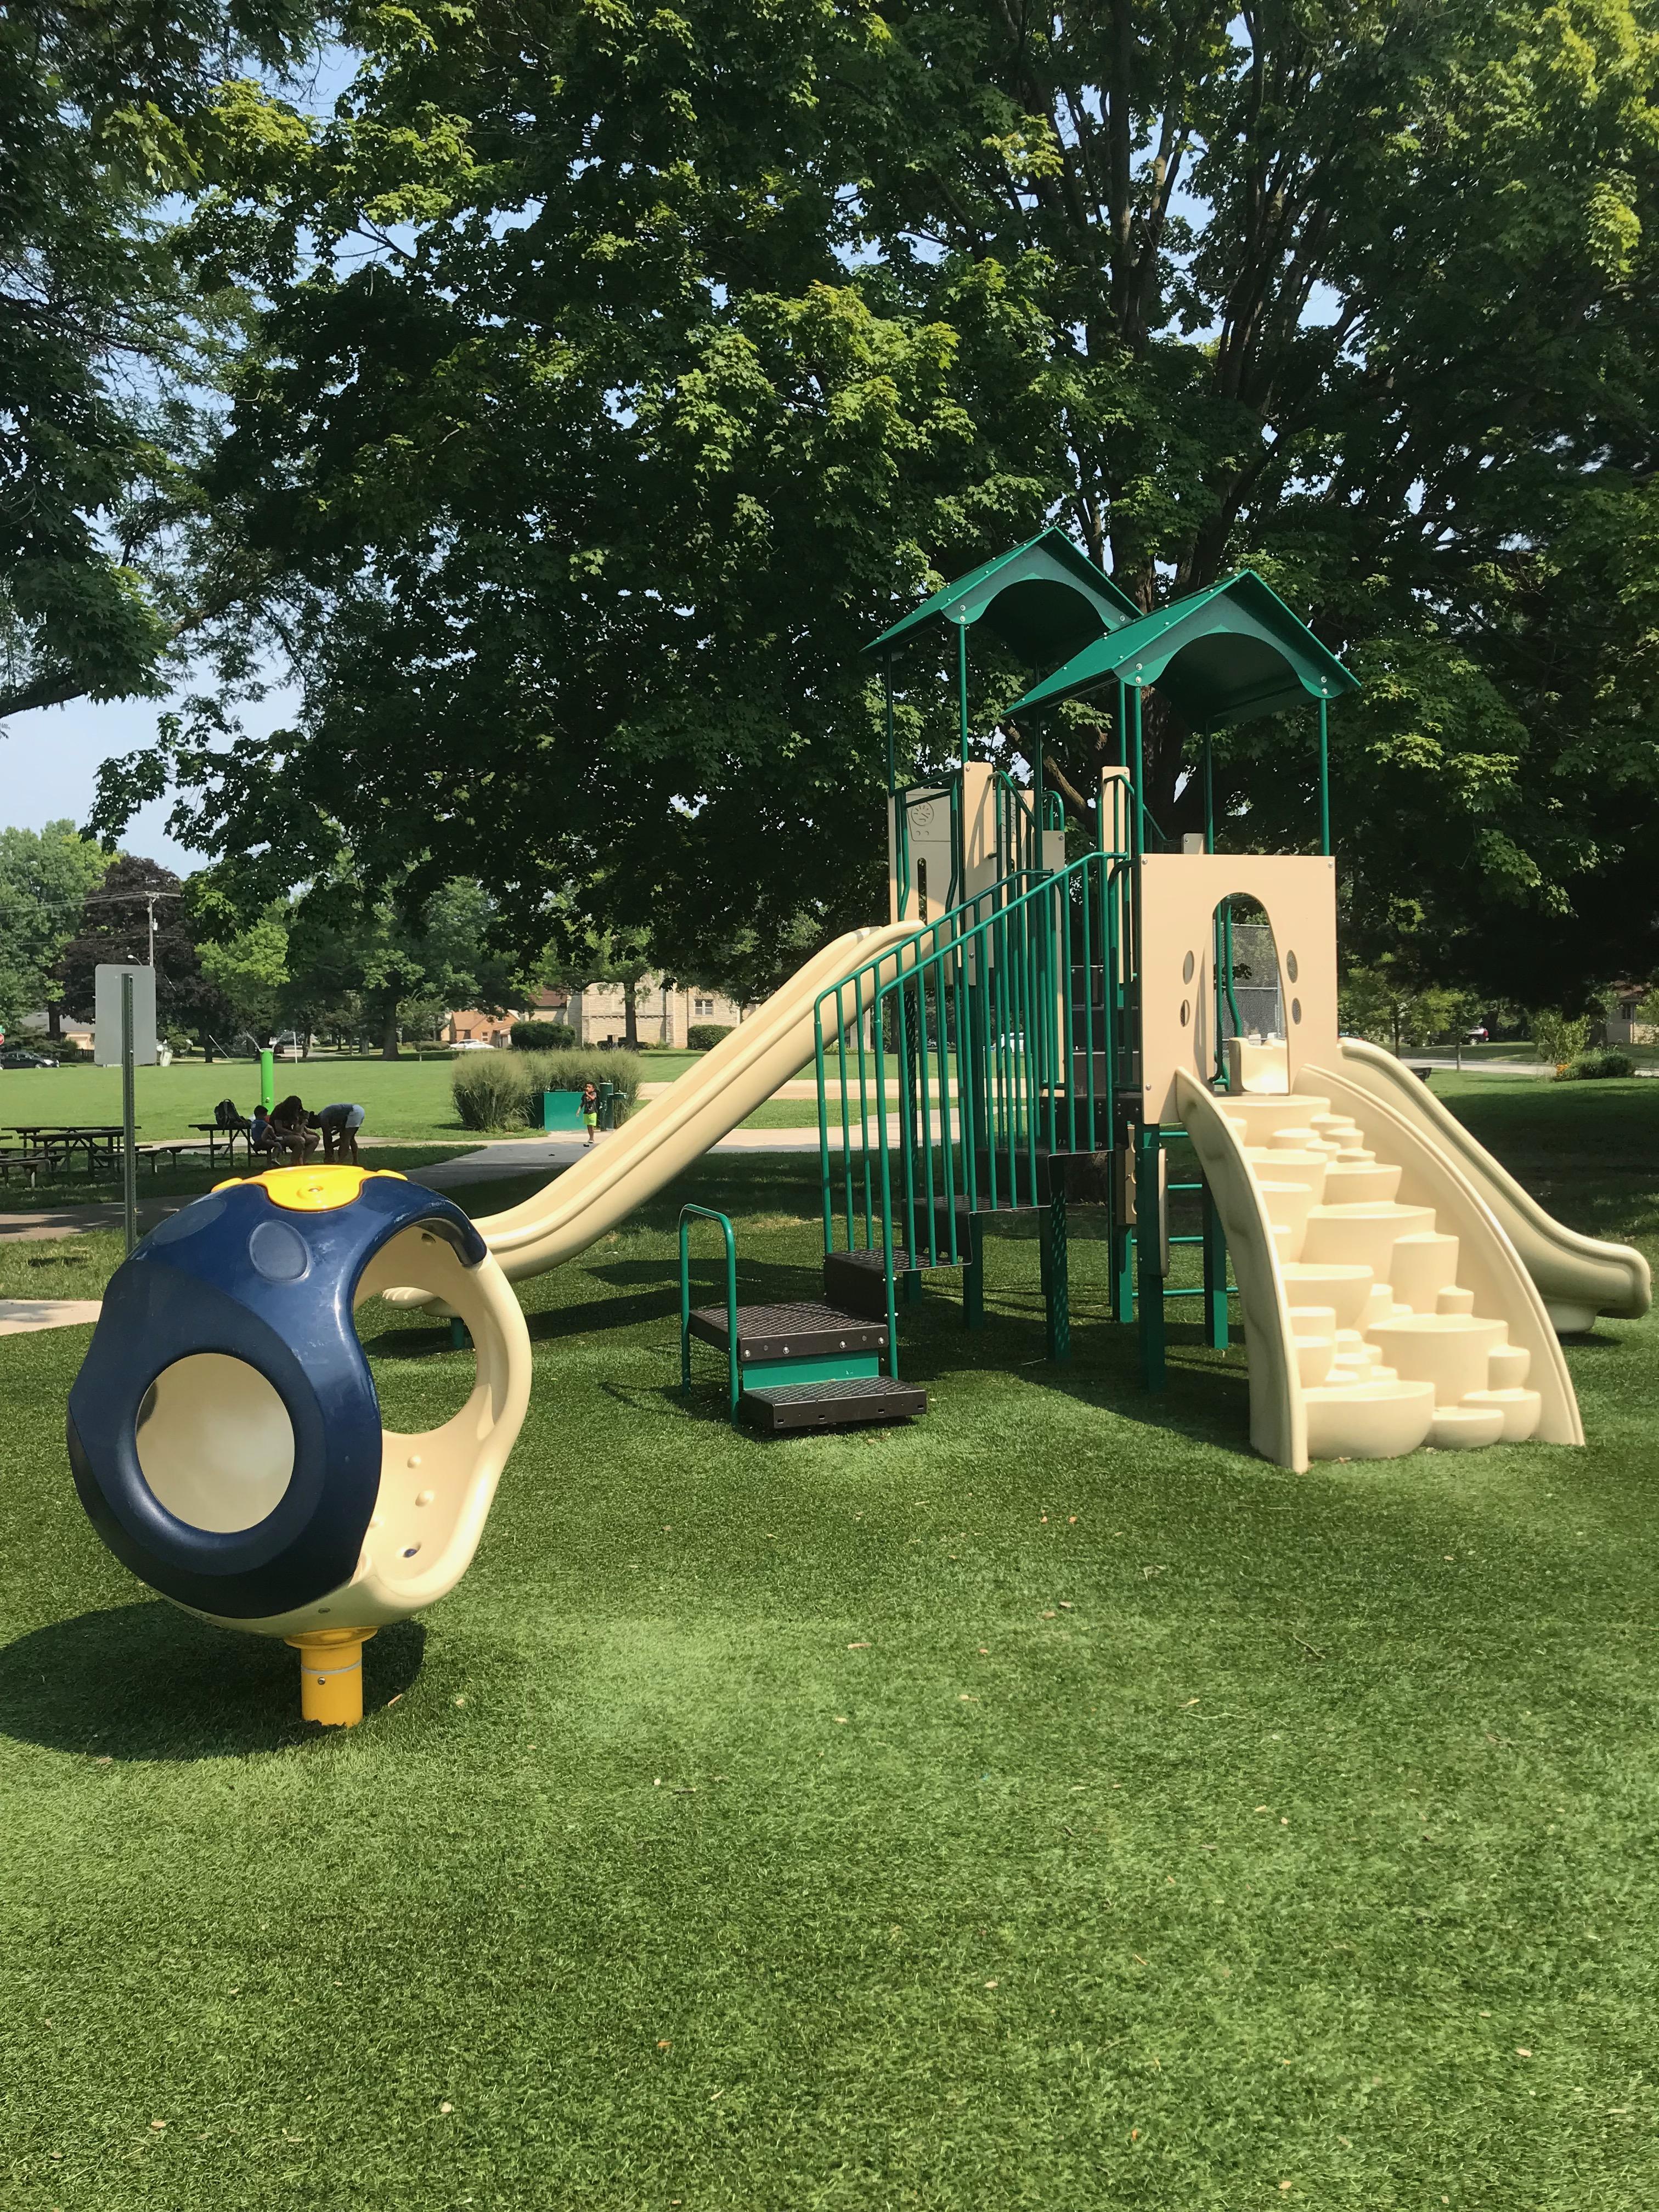 Highland Park, Rockford, IL